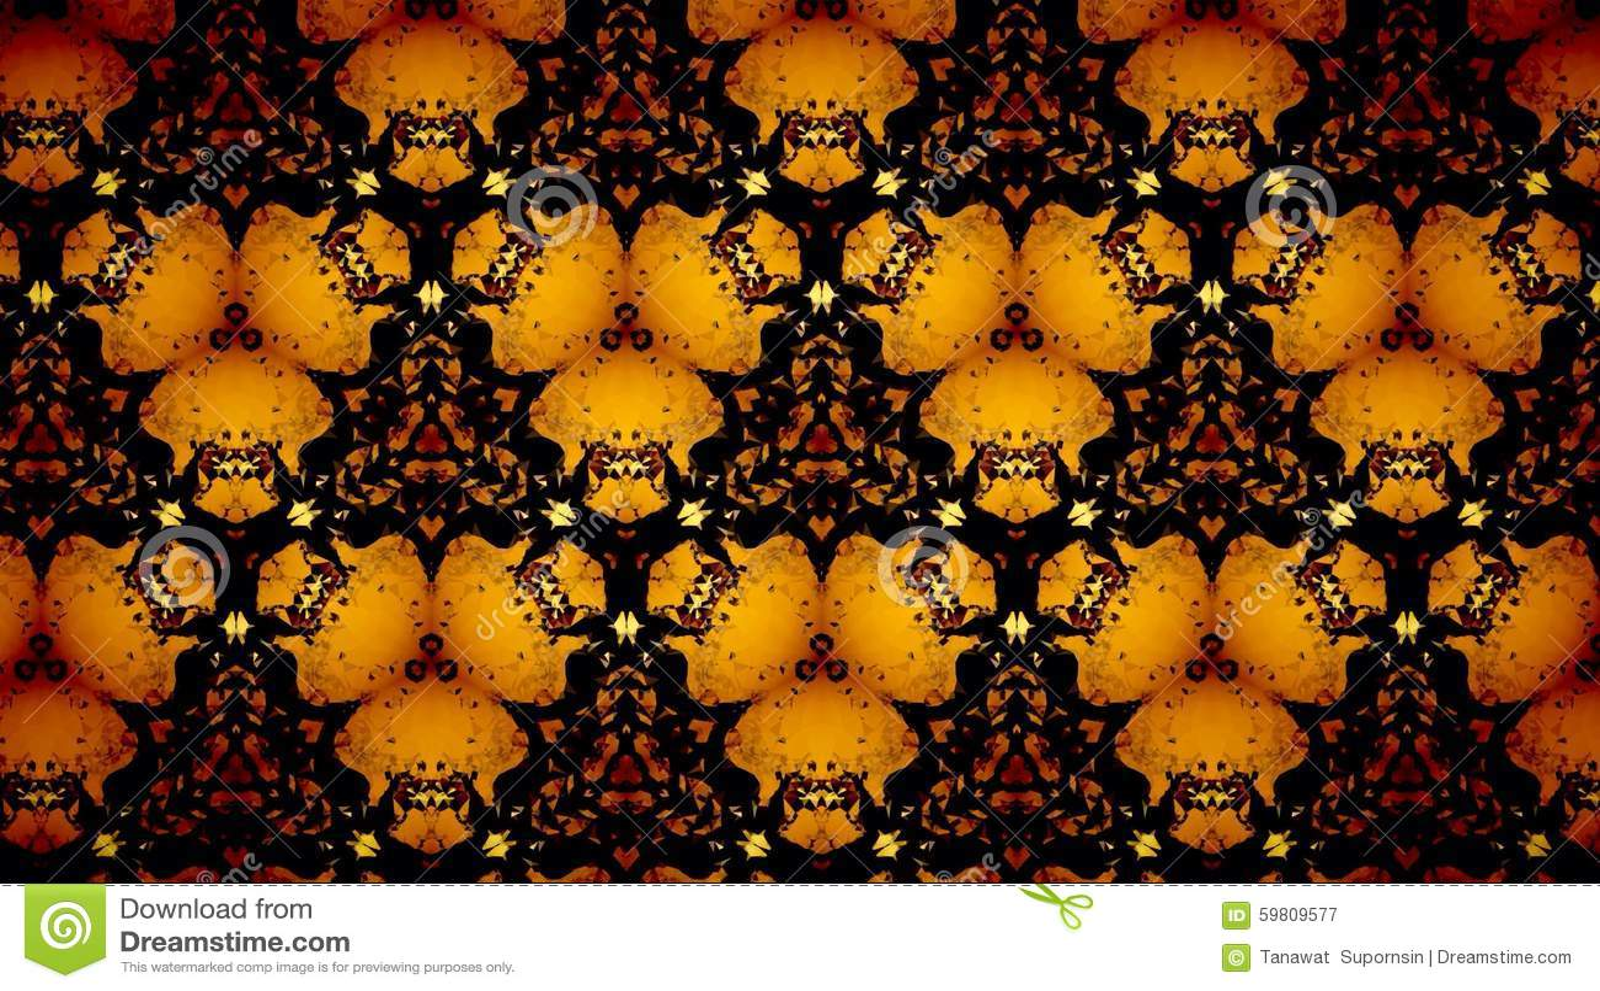 halloween orange and black wallpaper - photo #20